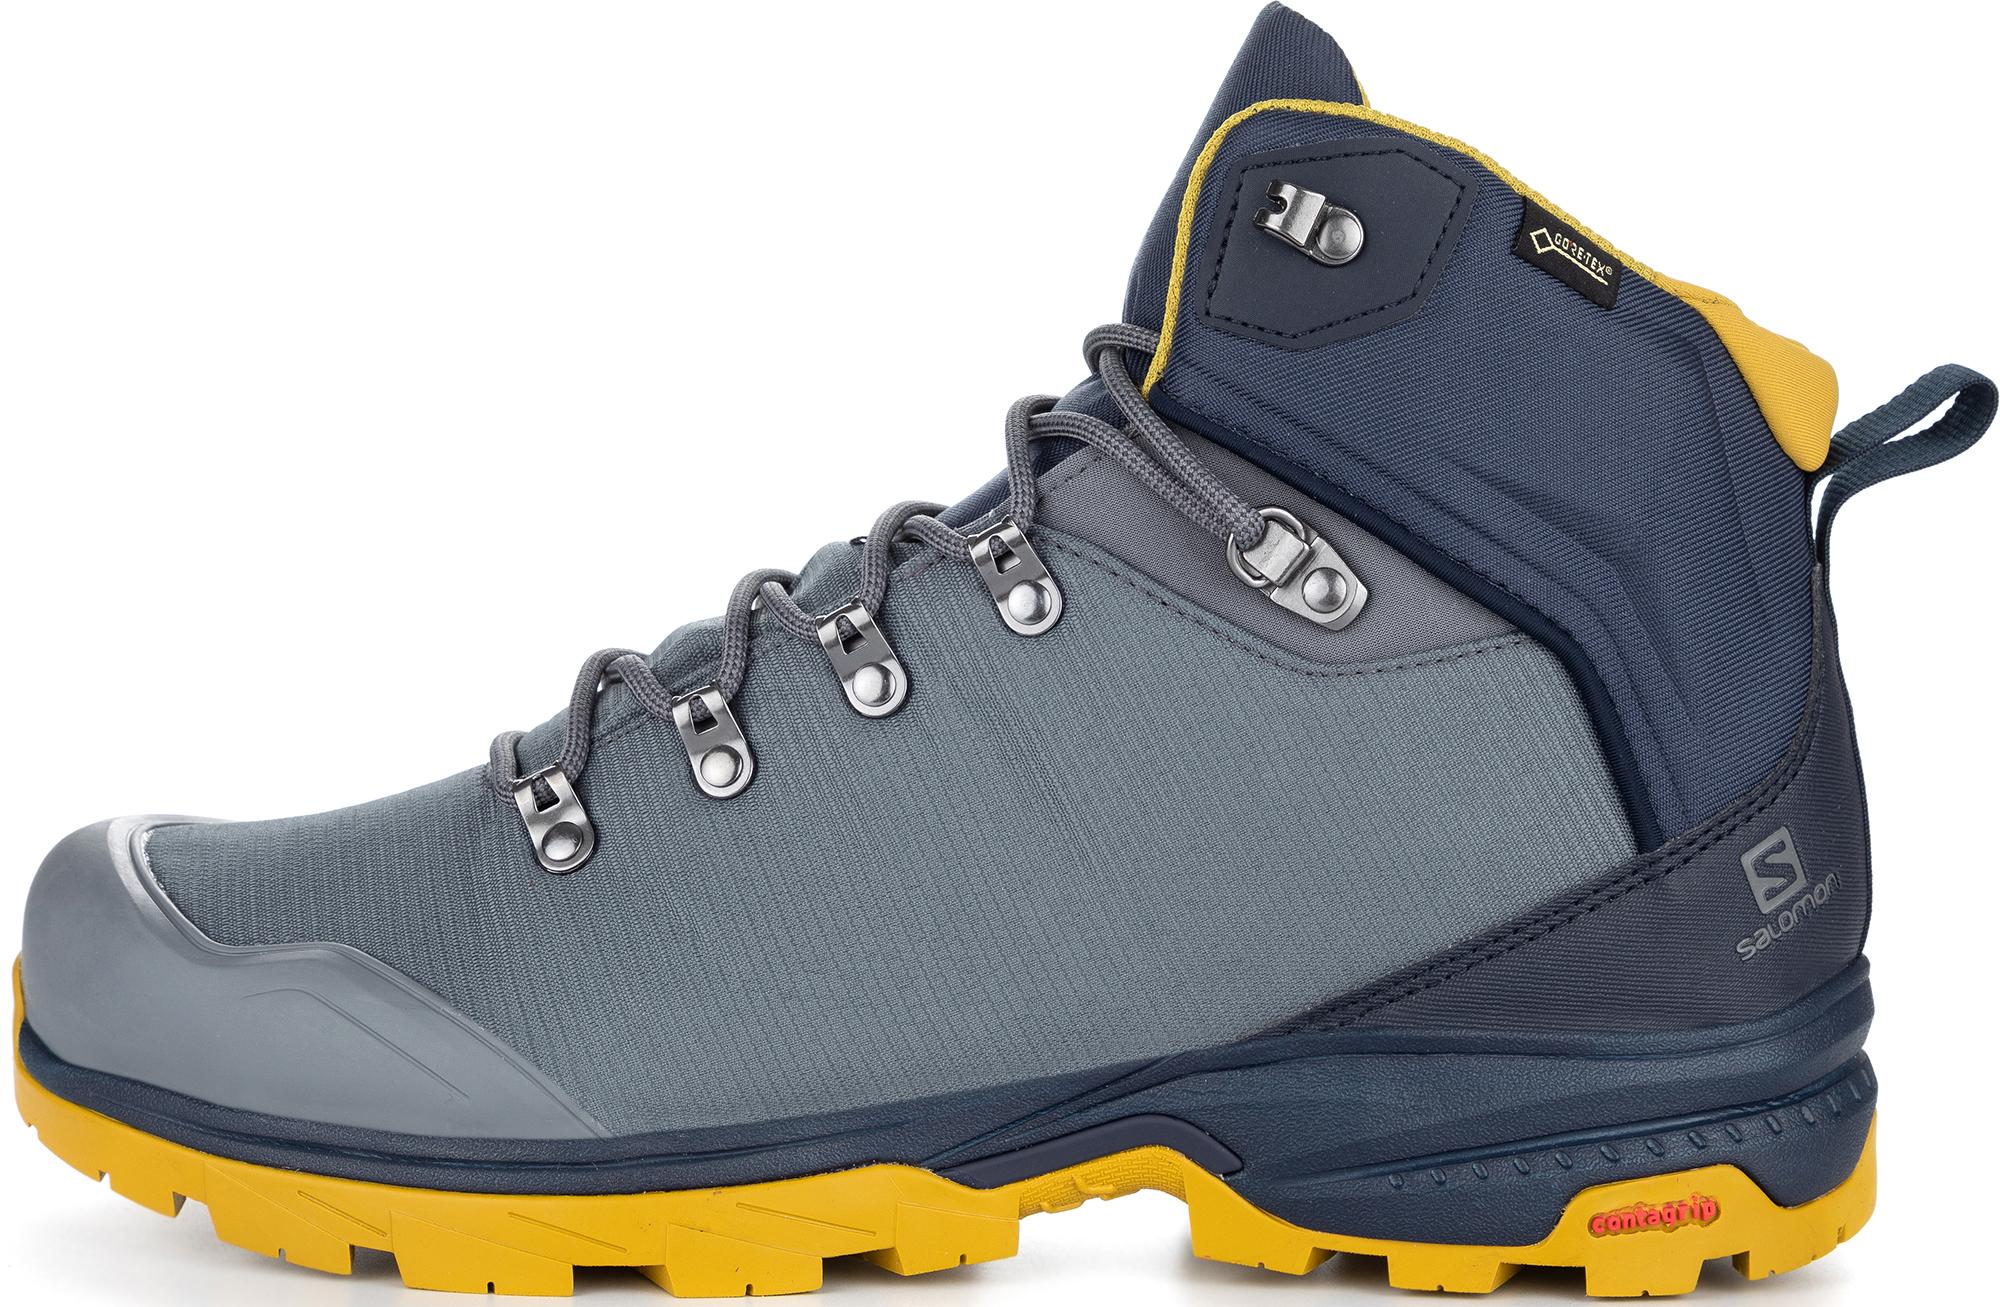 Salomon Ботинки мужские Salomon OUTback 500, размер 42 salomon ботинки утепленные мужские salomon crusano размер 40